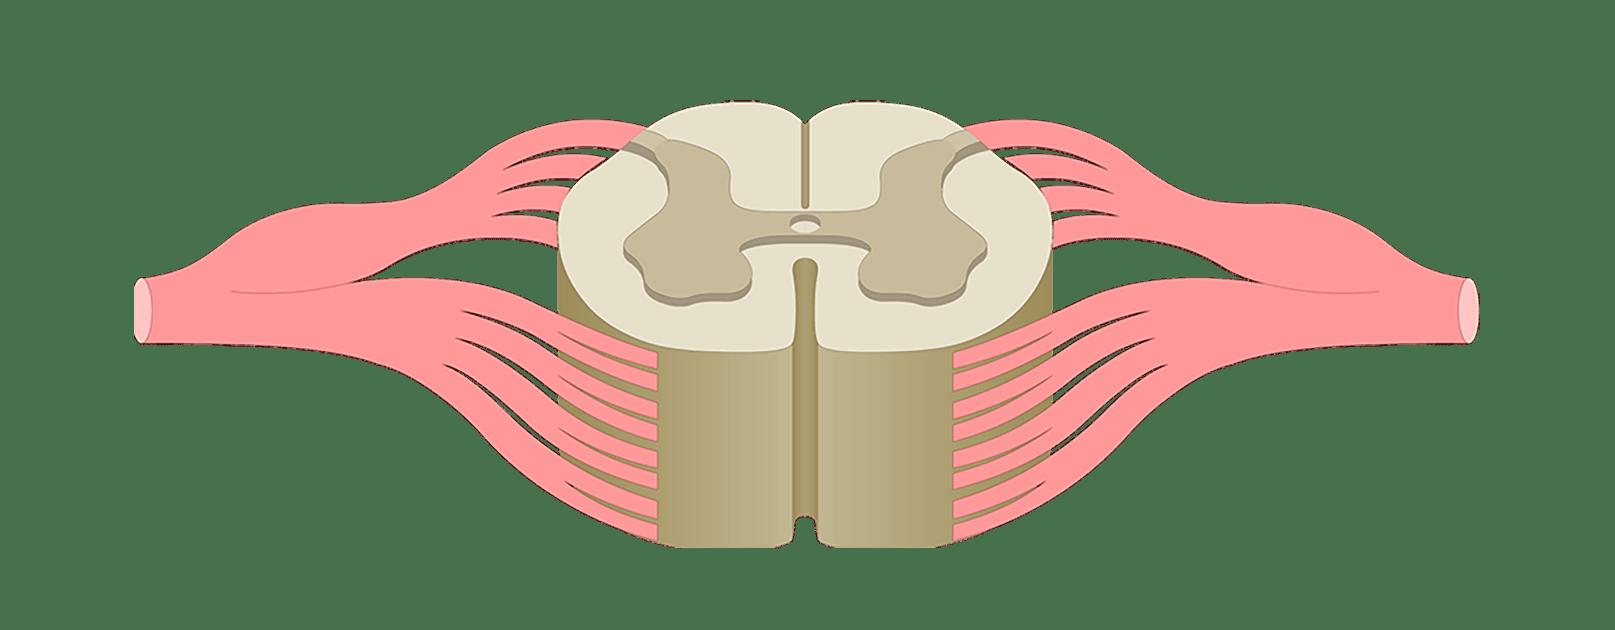 respiratory diagram unlabeled 2000 pontiac grand prix wiring spinal cord quiz: cross-sectional anatomy